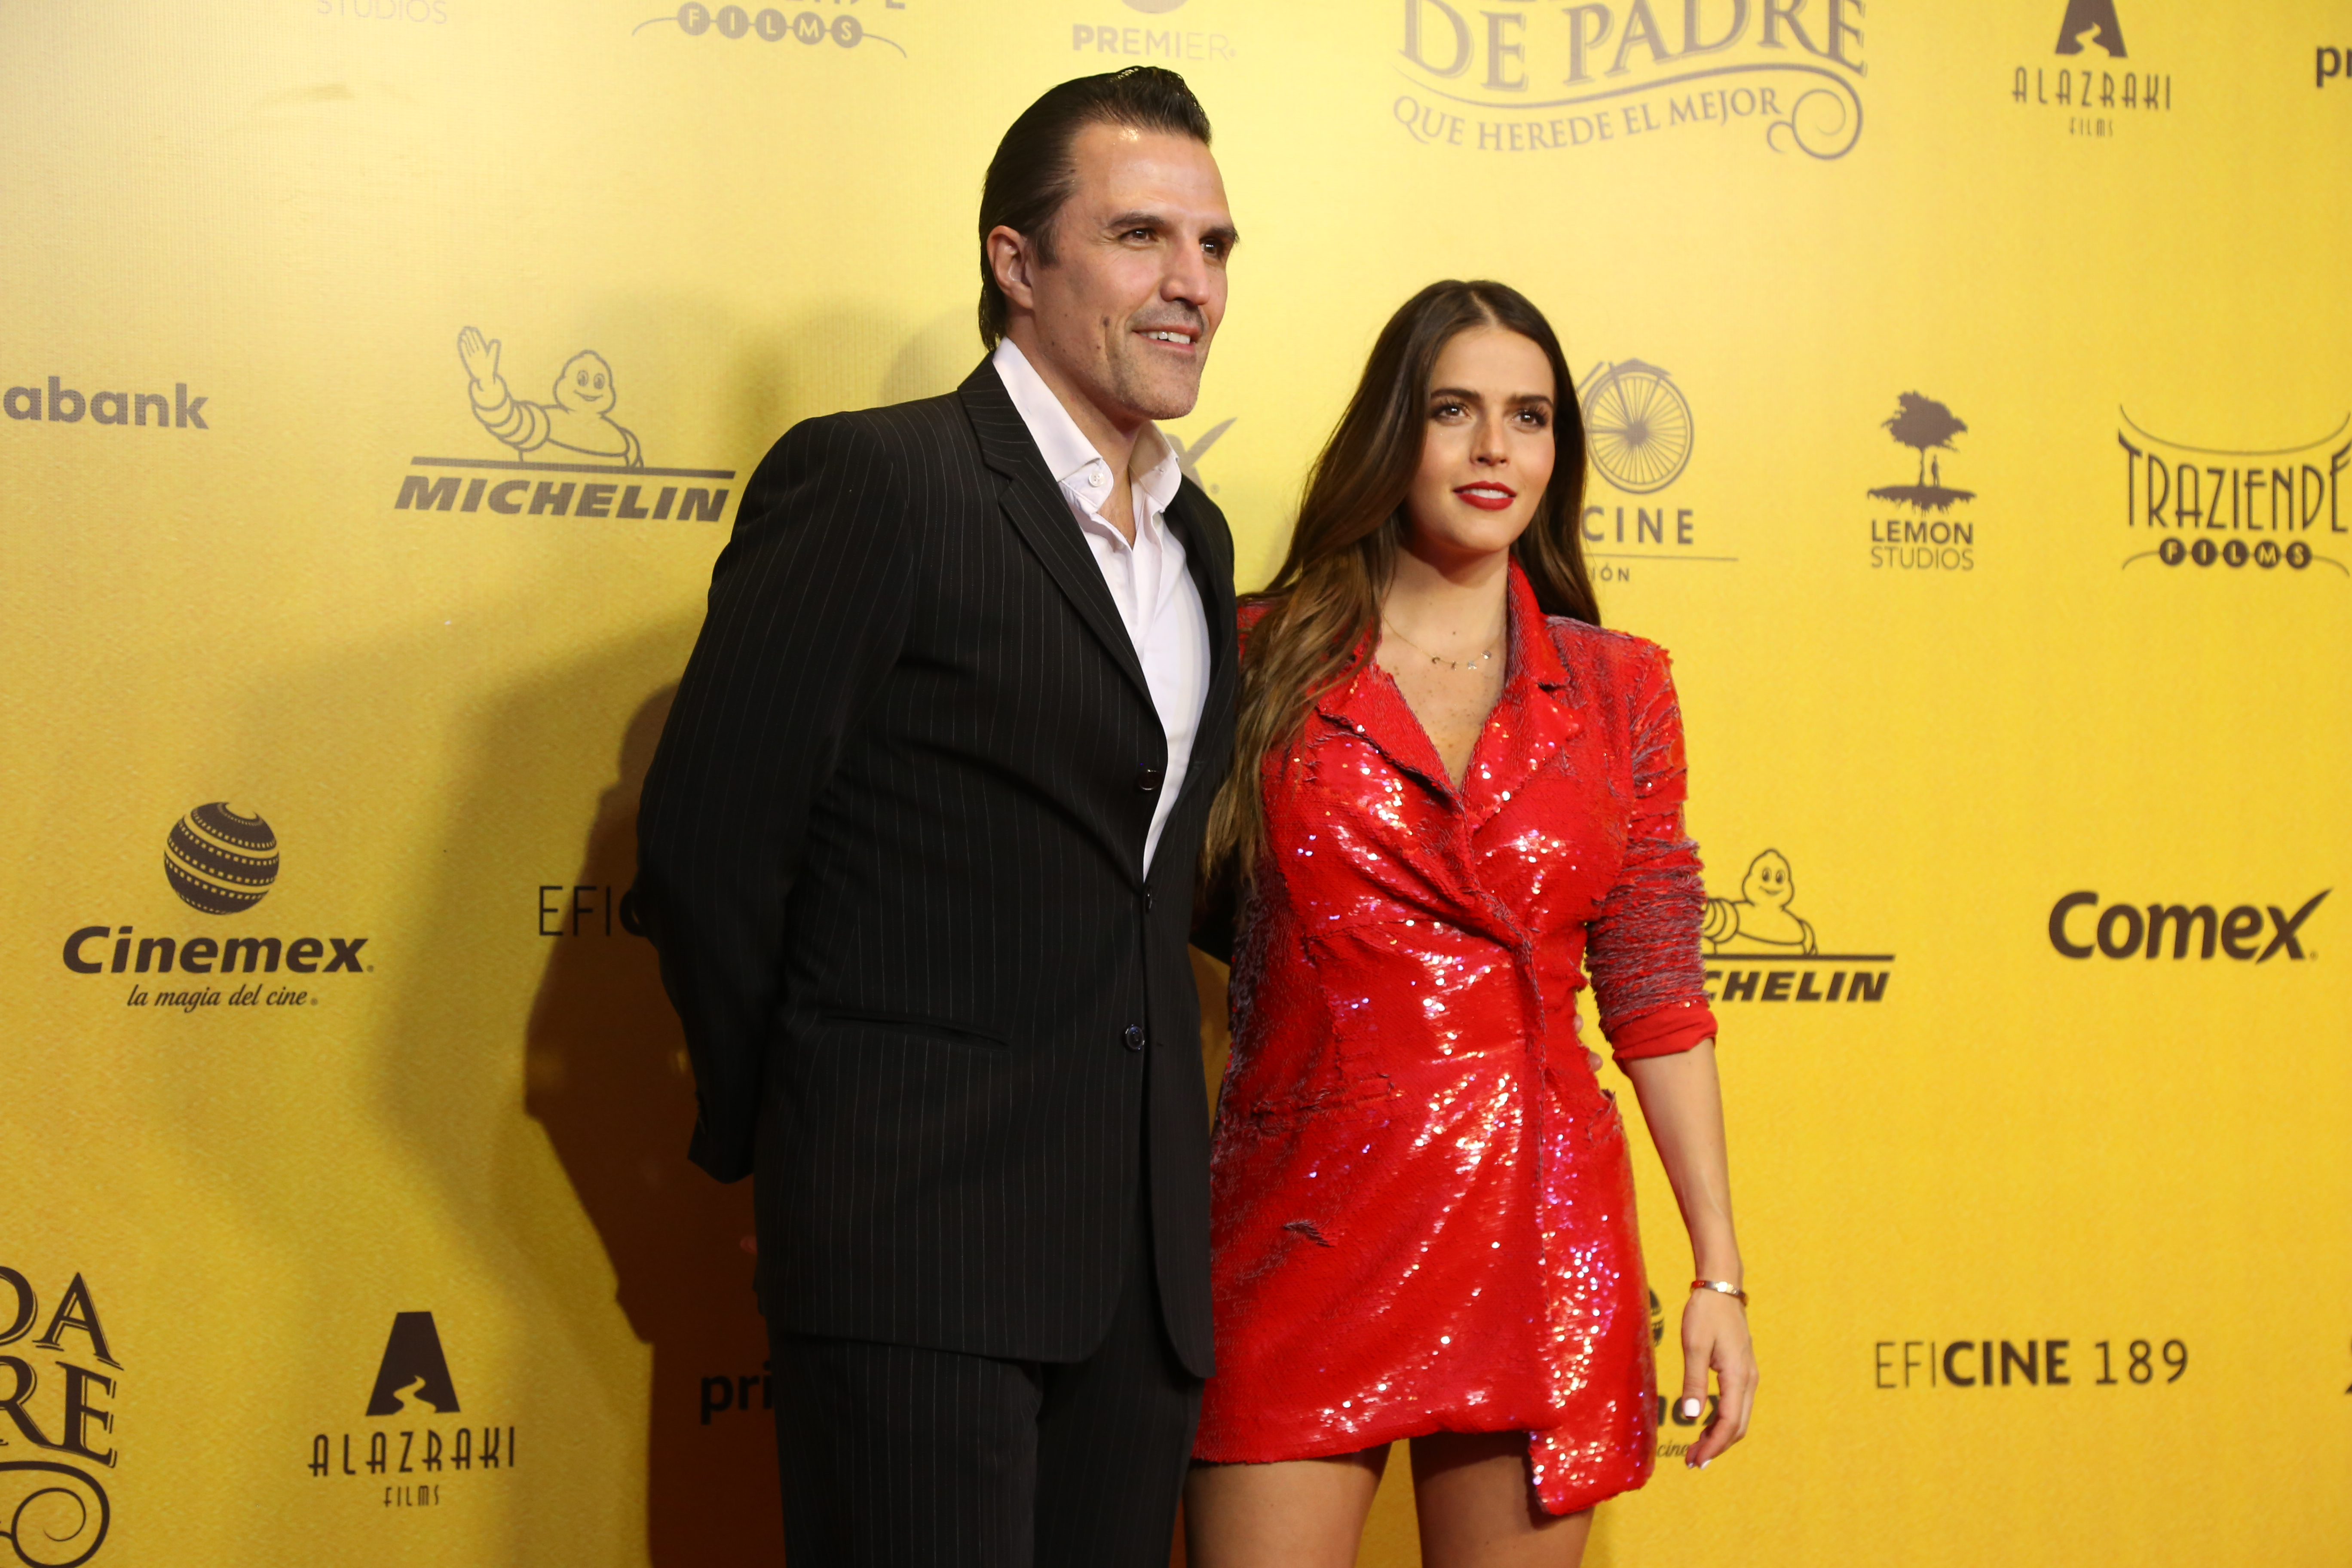 Billy Rovzar y Claudia Álvarez